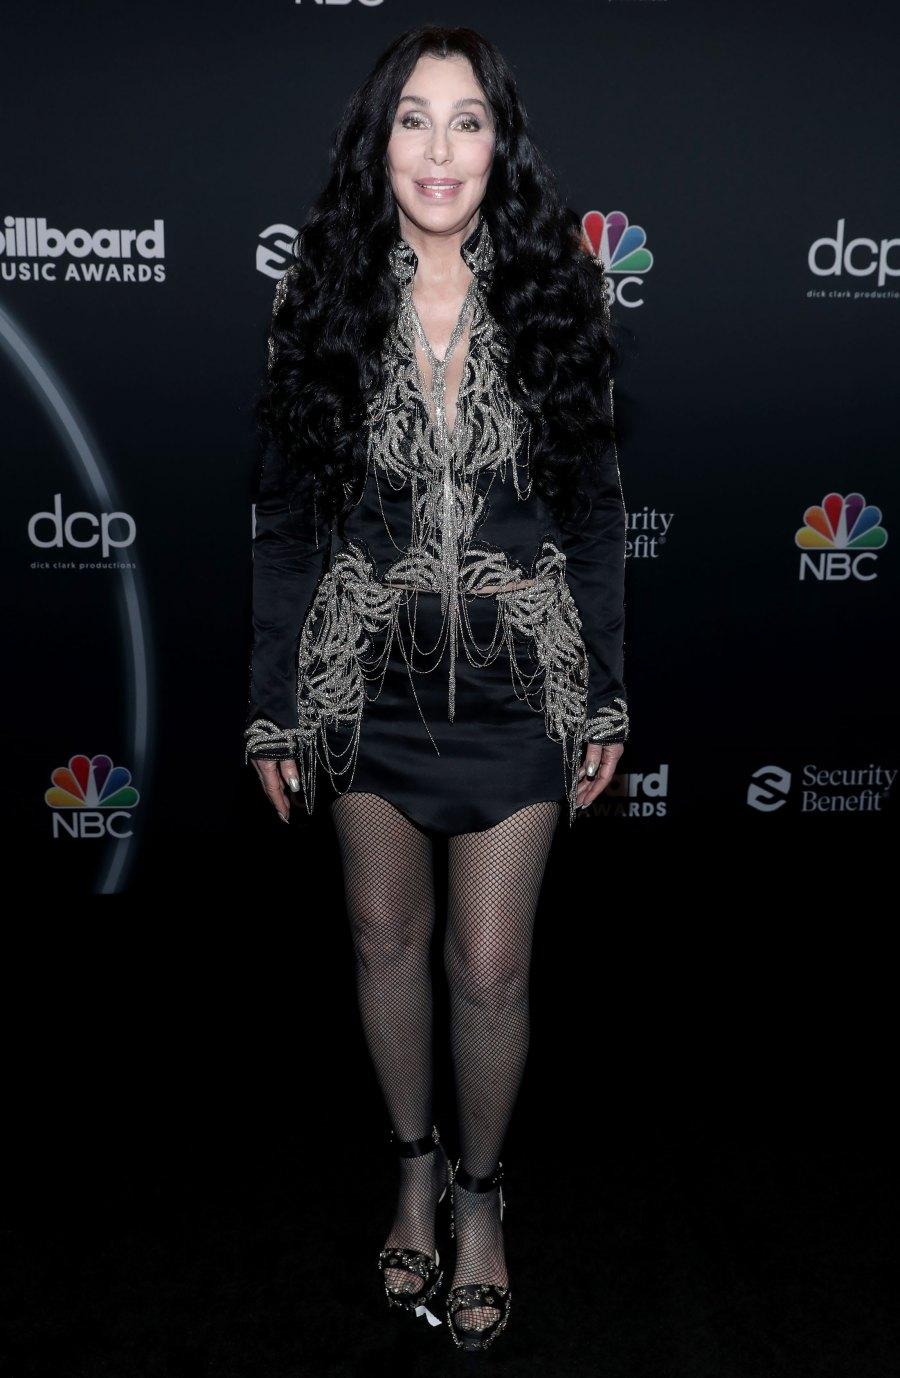 Cher aux Billboard music awards